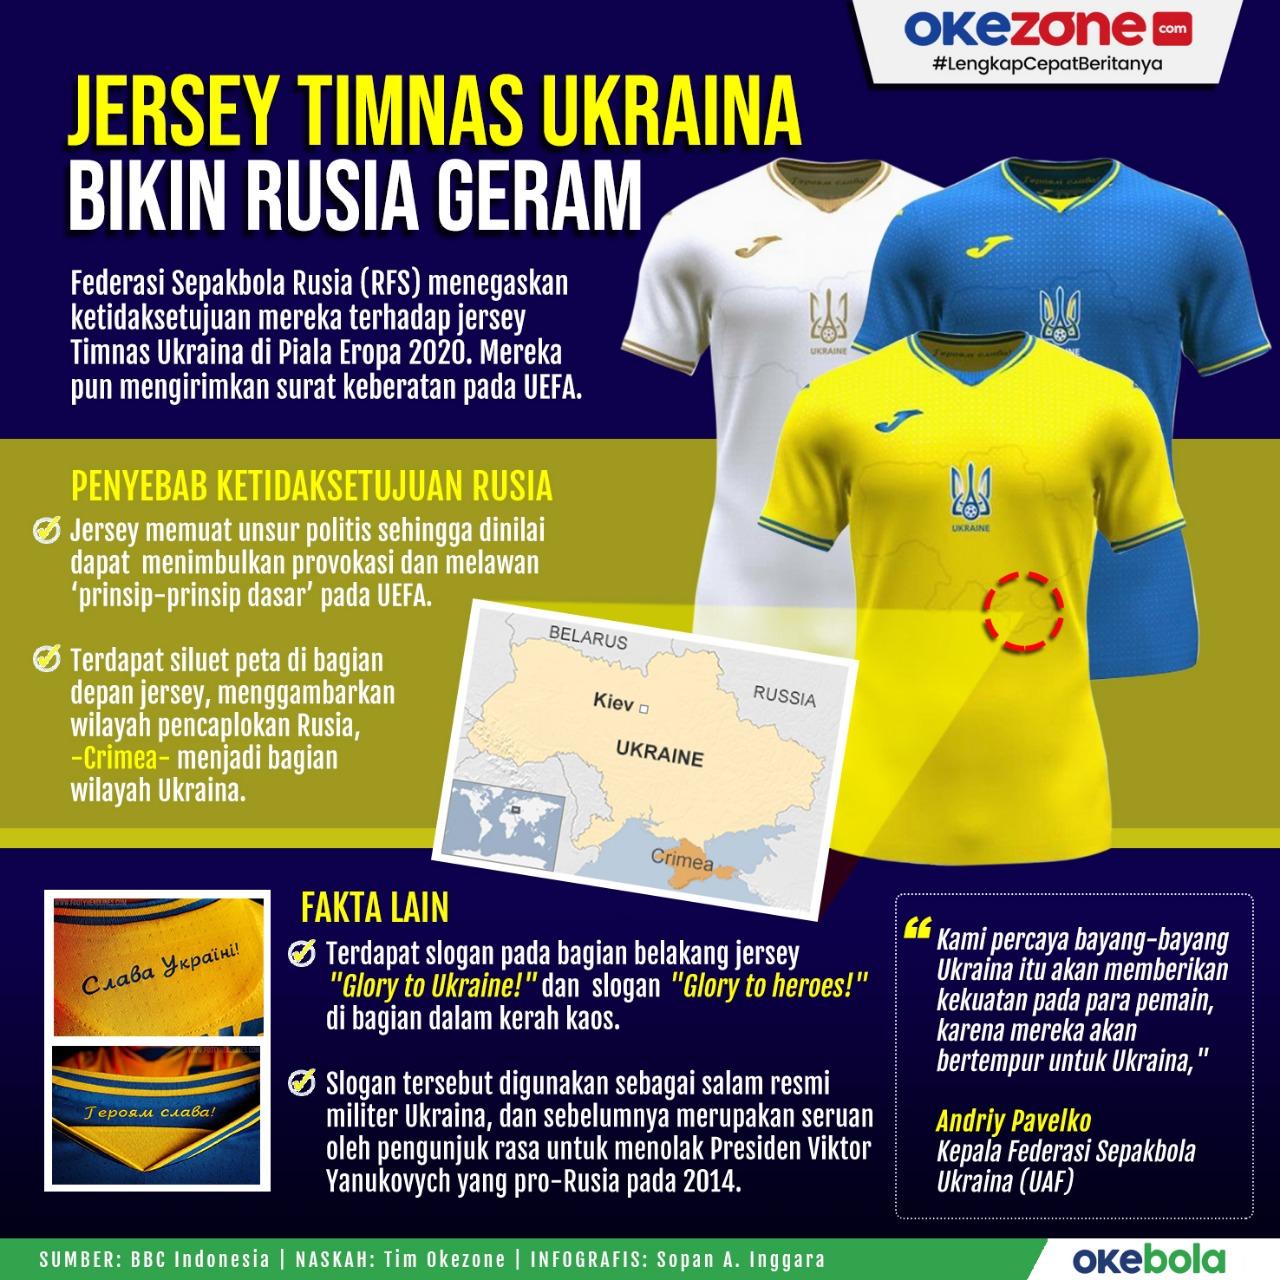 Jersey Timnas Ukraina Bikin Rusia Geram -